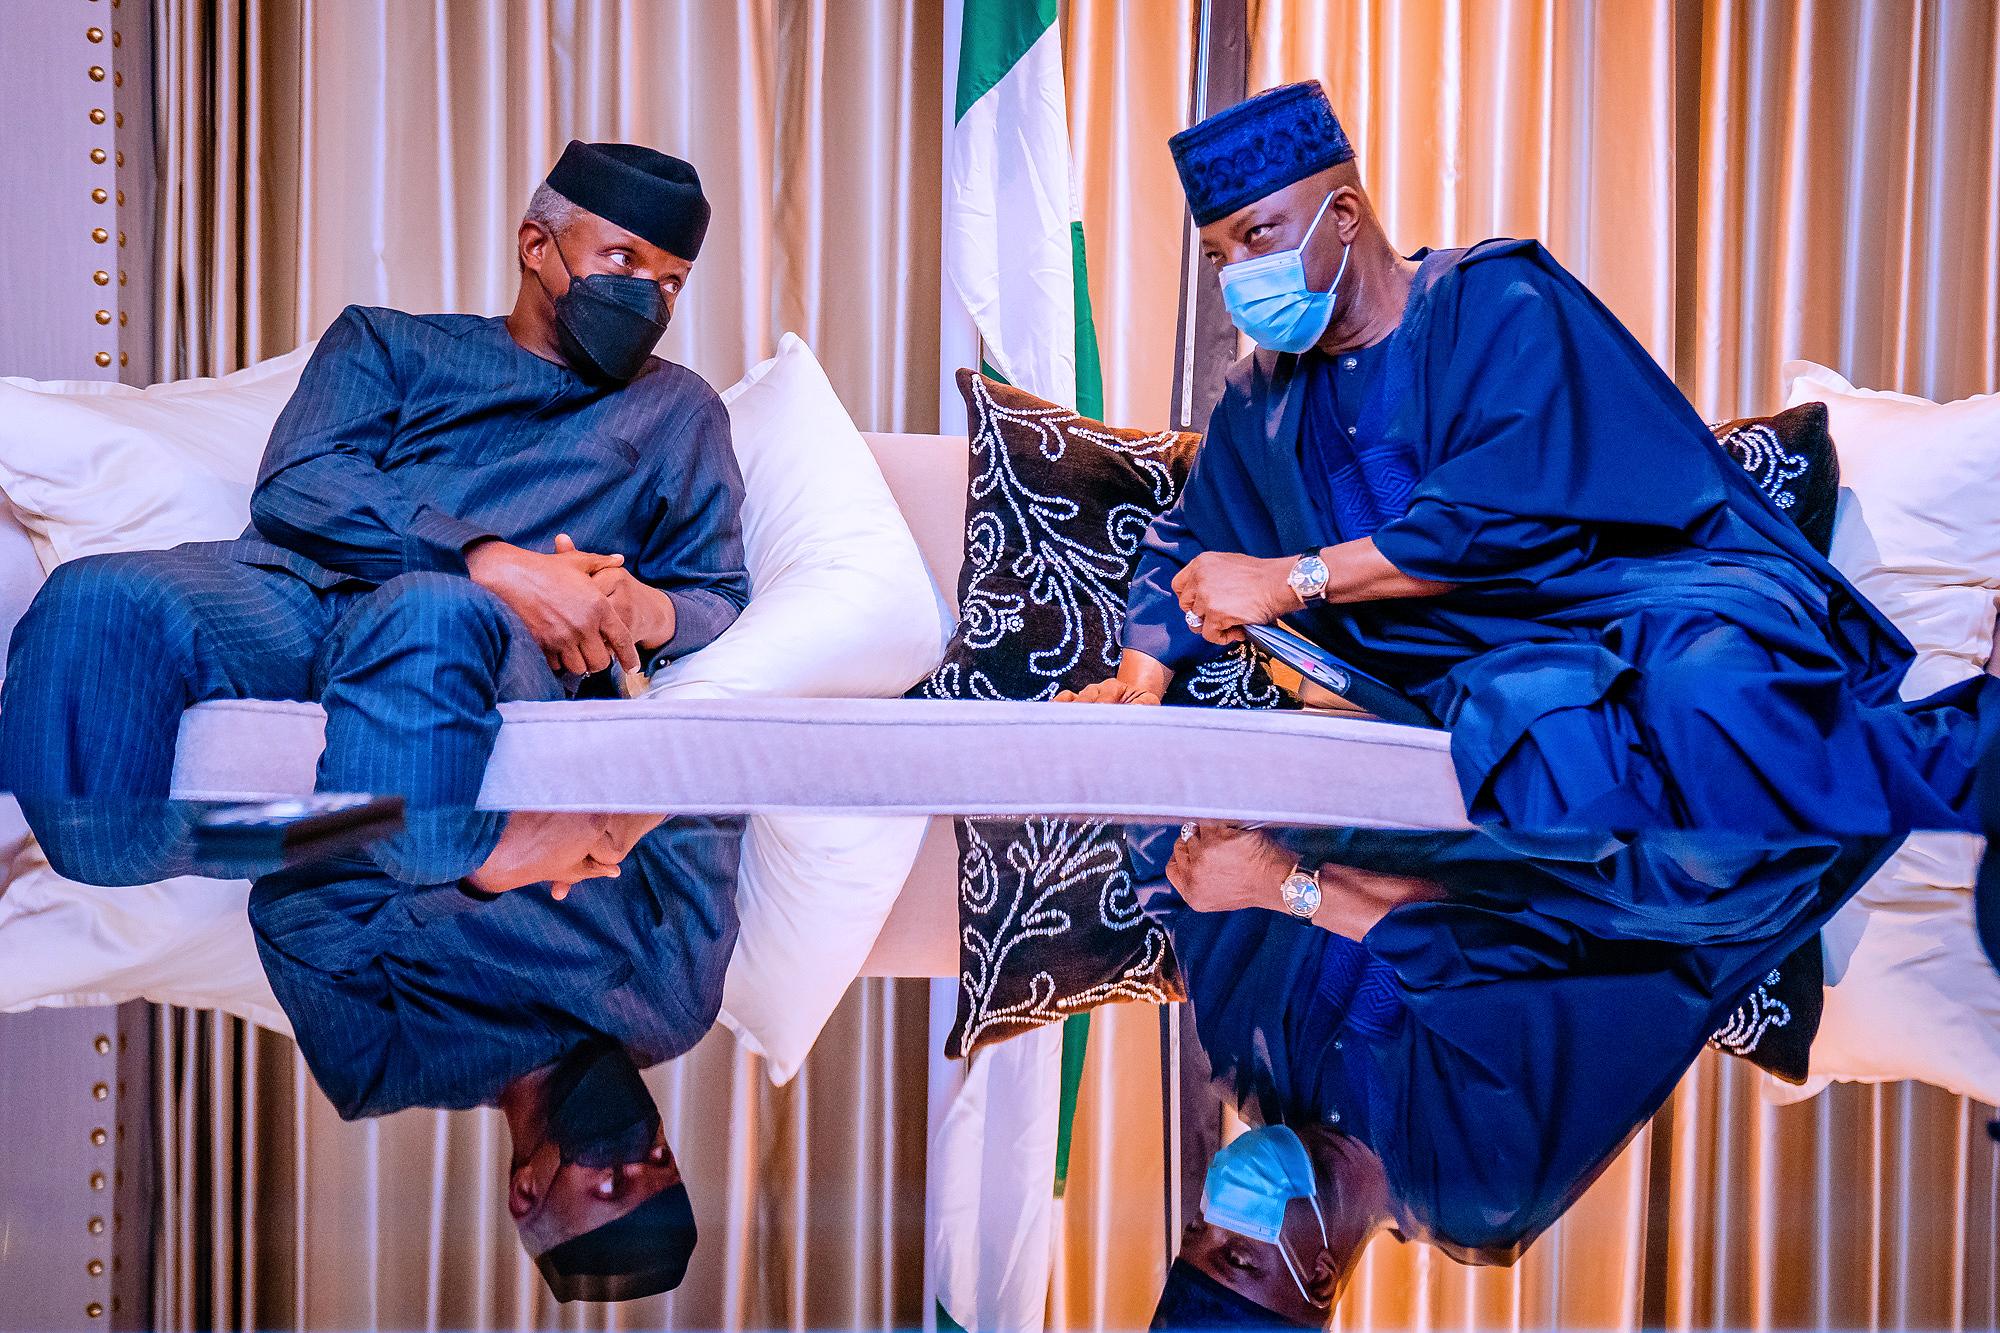 Vice President Yemi Osinbajo SAN receives briefing from Nigeria High Commissioner to the UK Ambassador Sarafa Tunji Ishola